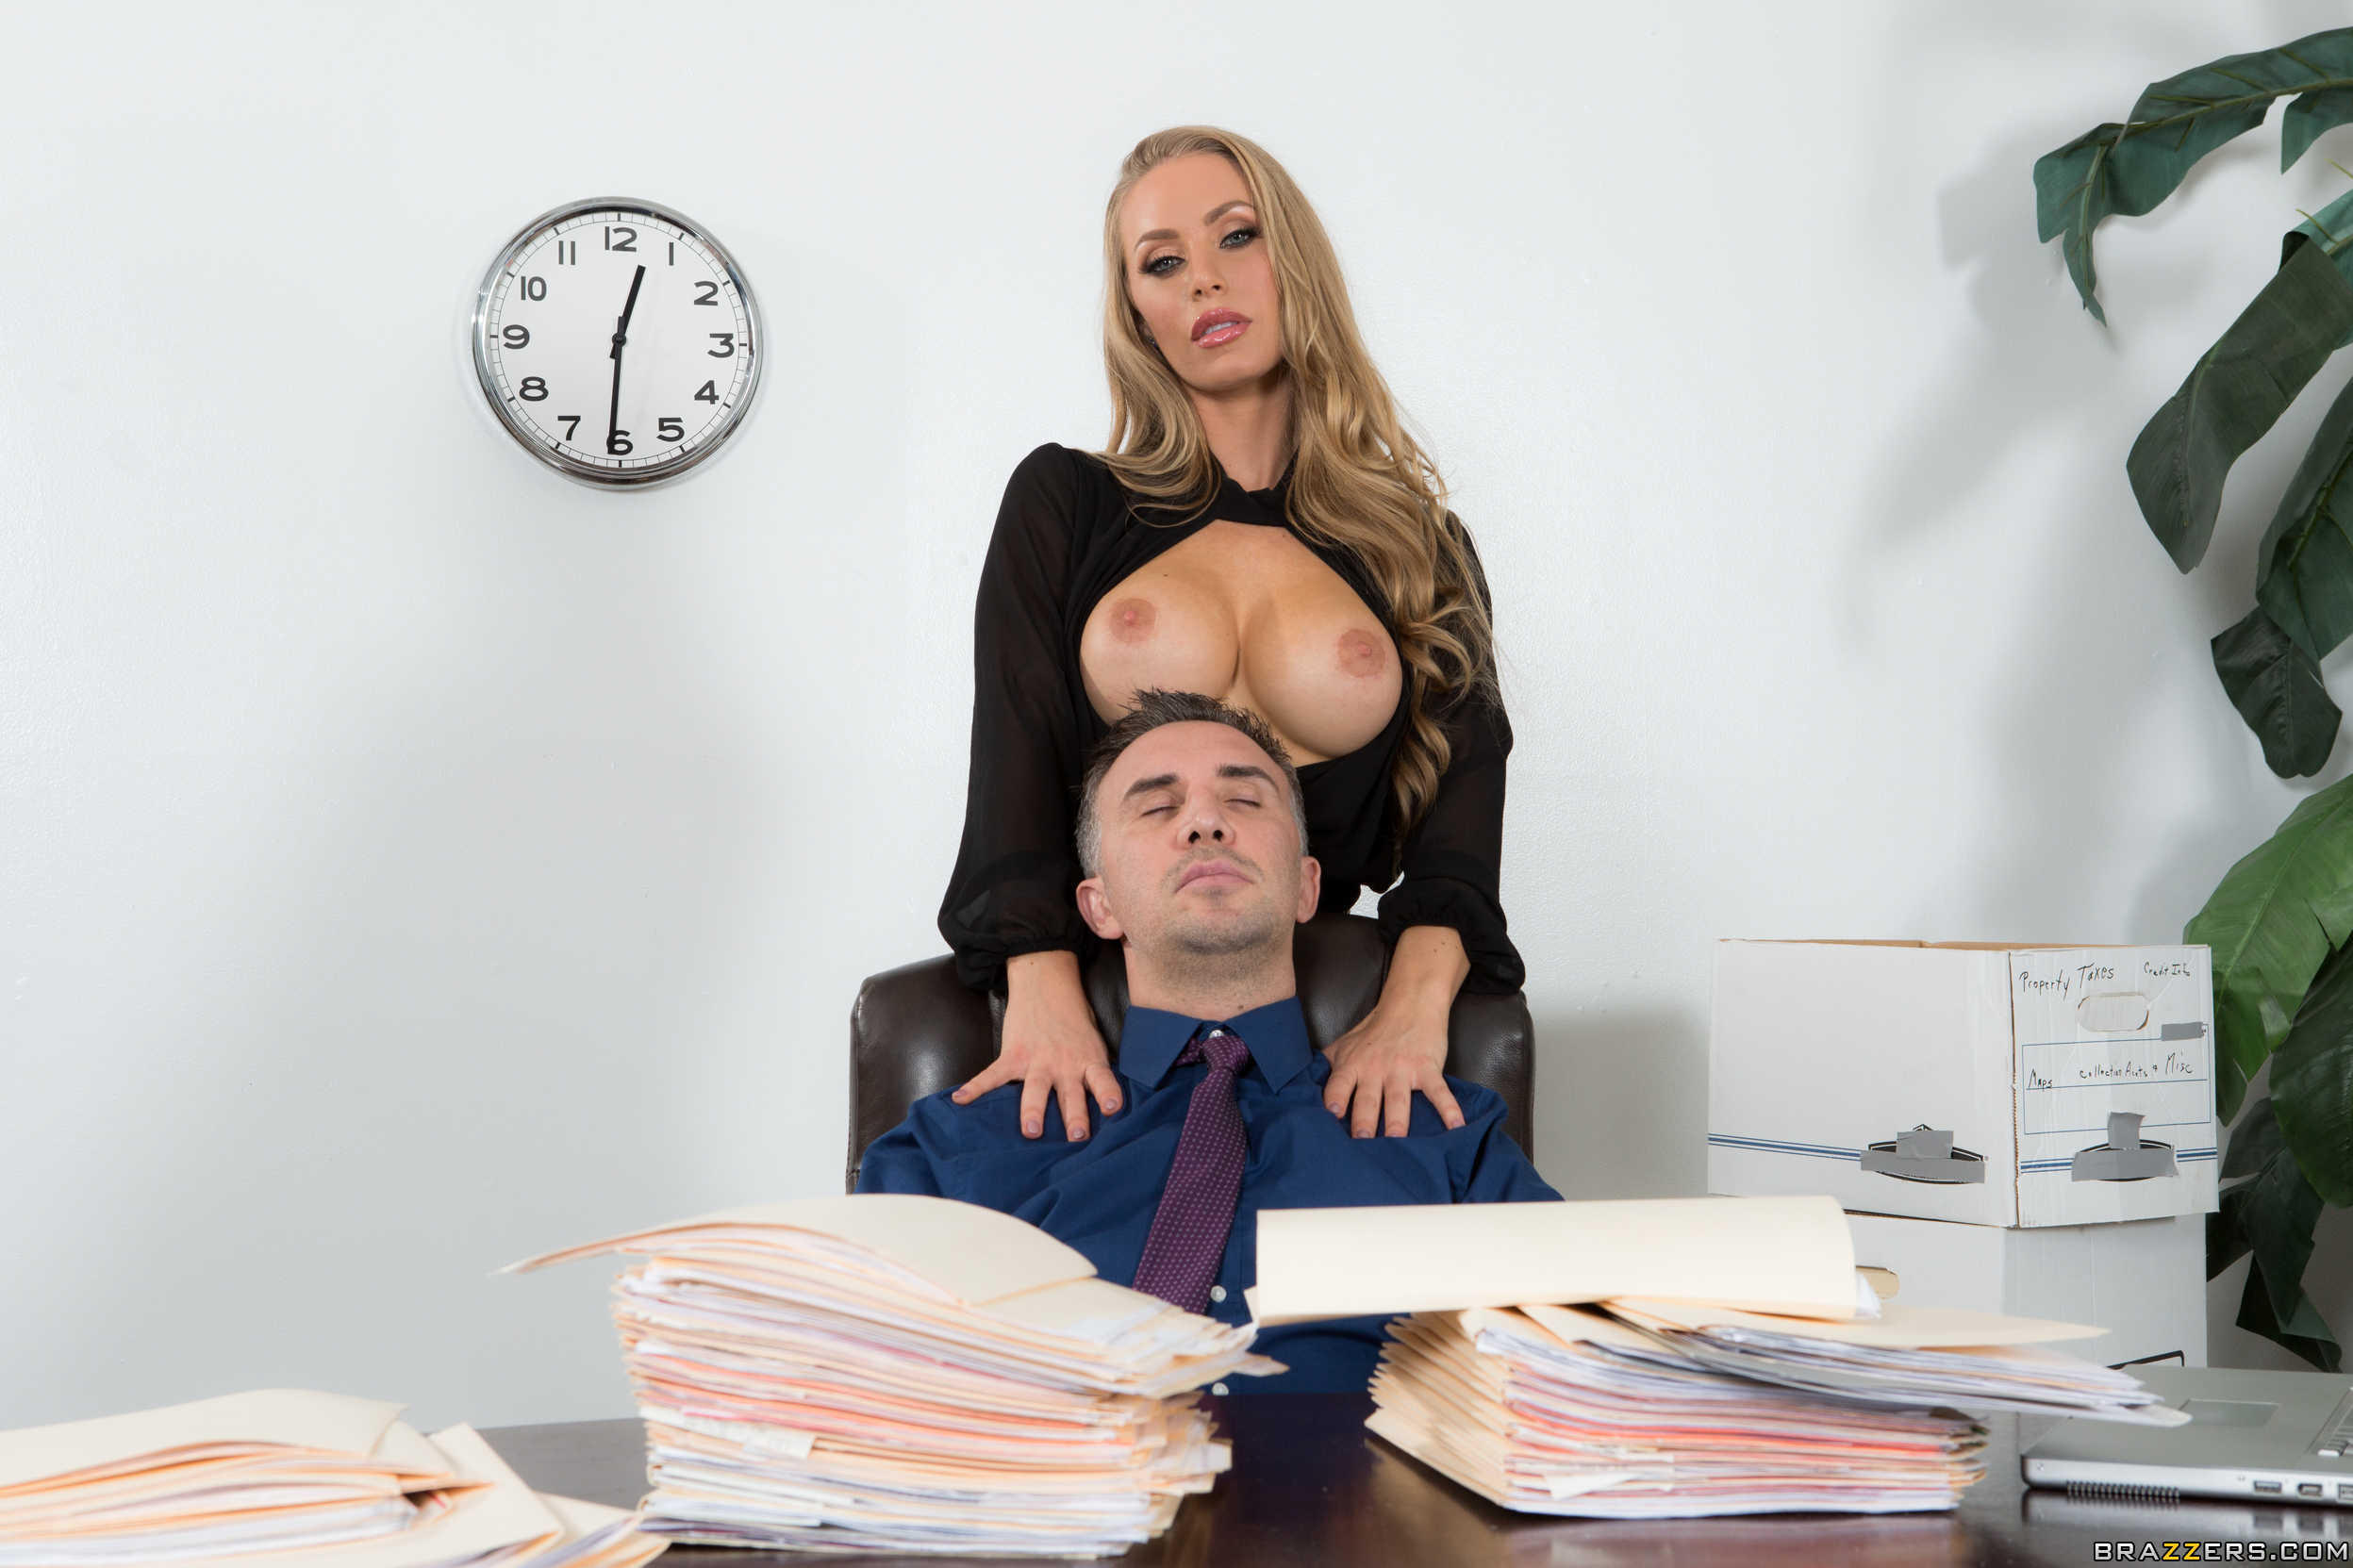 провести секретарша сопротивлялась видео фото девушек можно